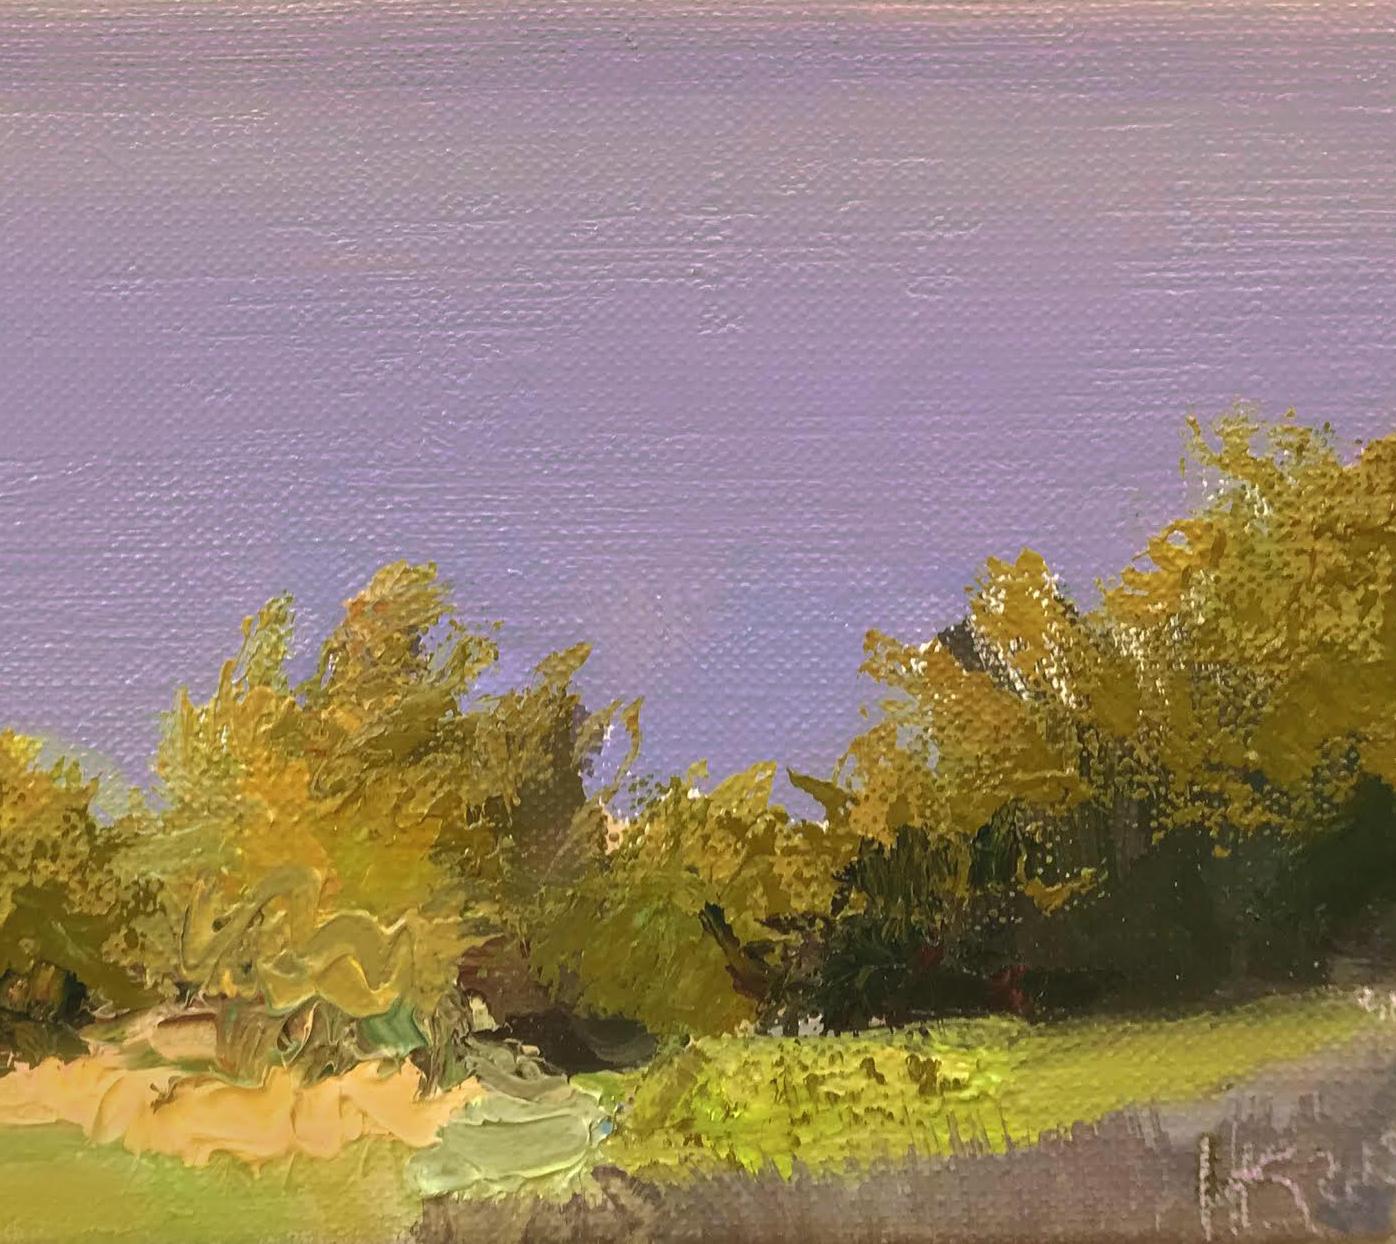 July, 2018, oil canvas, 20x24 cm фр